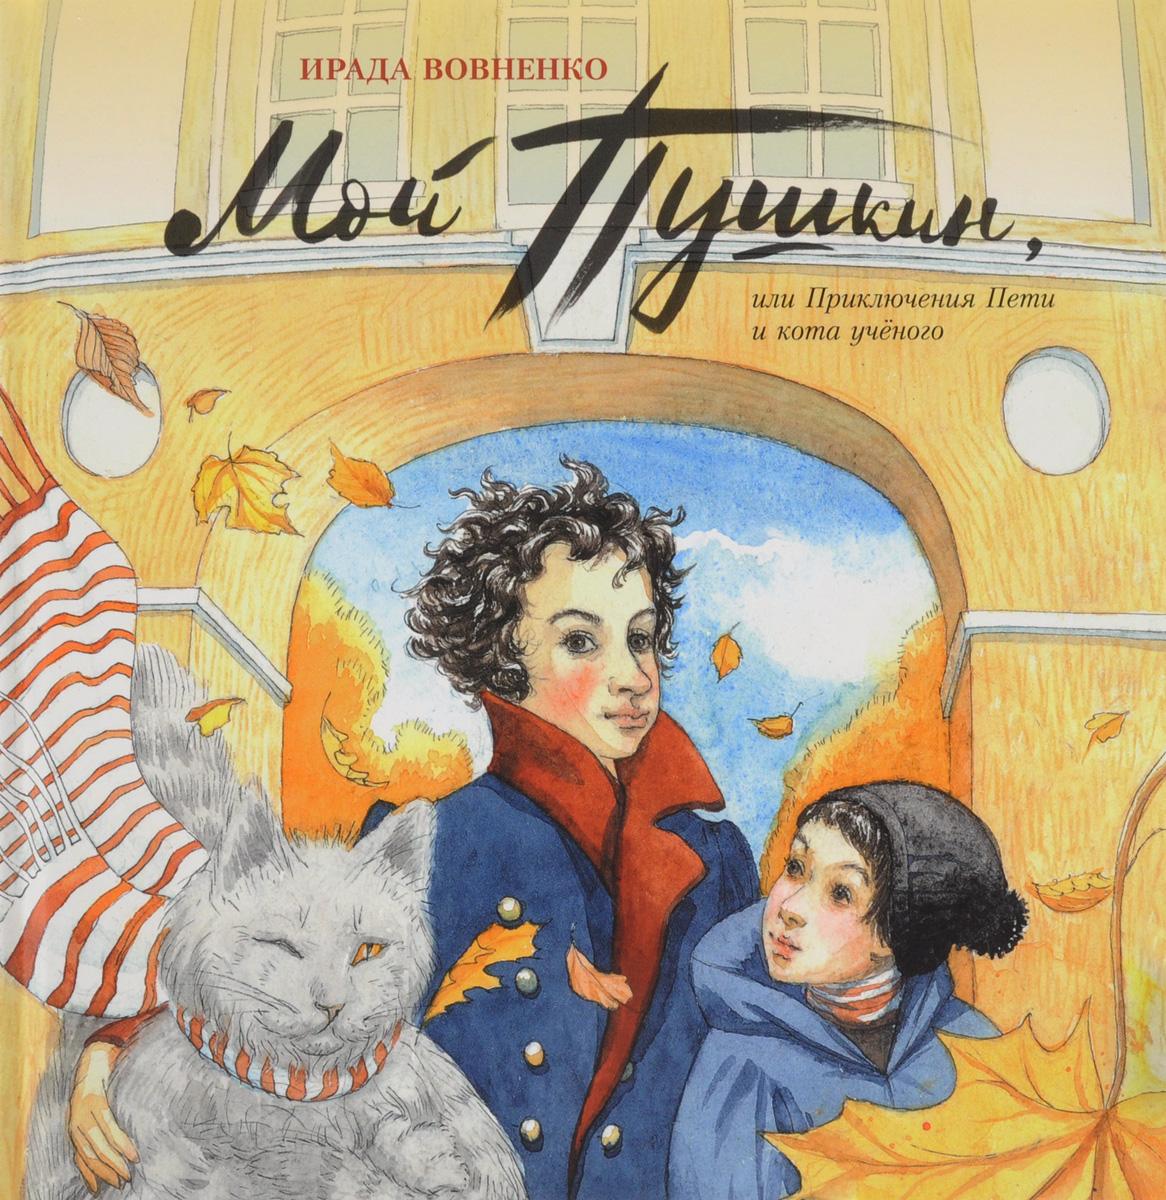 Ирада Вовненко Мой Пушкин, или Приключения Пети и кота ученого